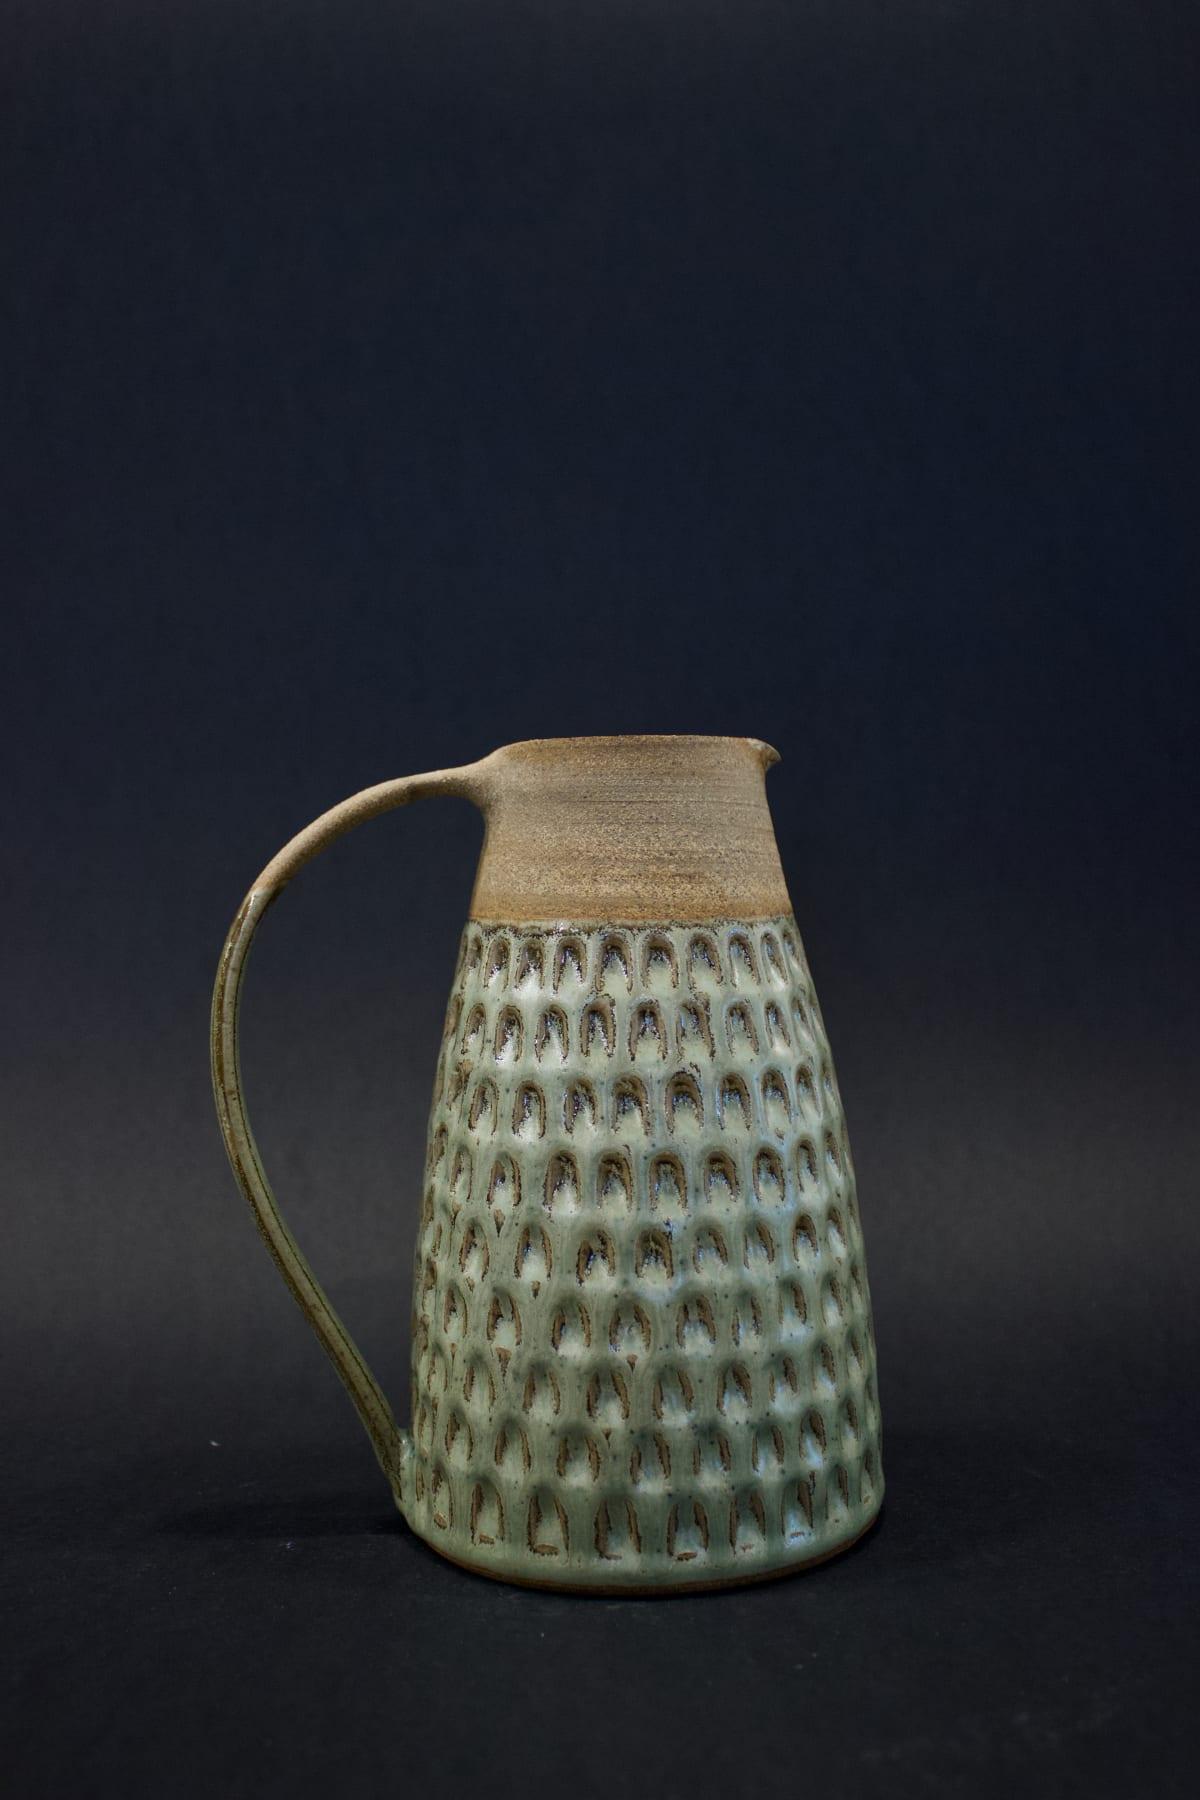 Kate Garwood Green Jug, 2019 Ceramic 18 x 14.5 x 10.5 cm 7 1/8 x 5 3/4 x 4 1/8 in